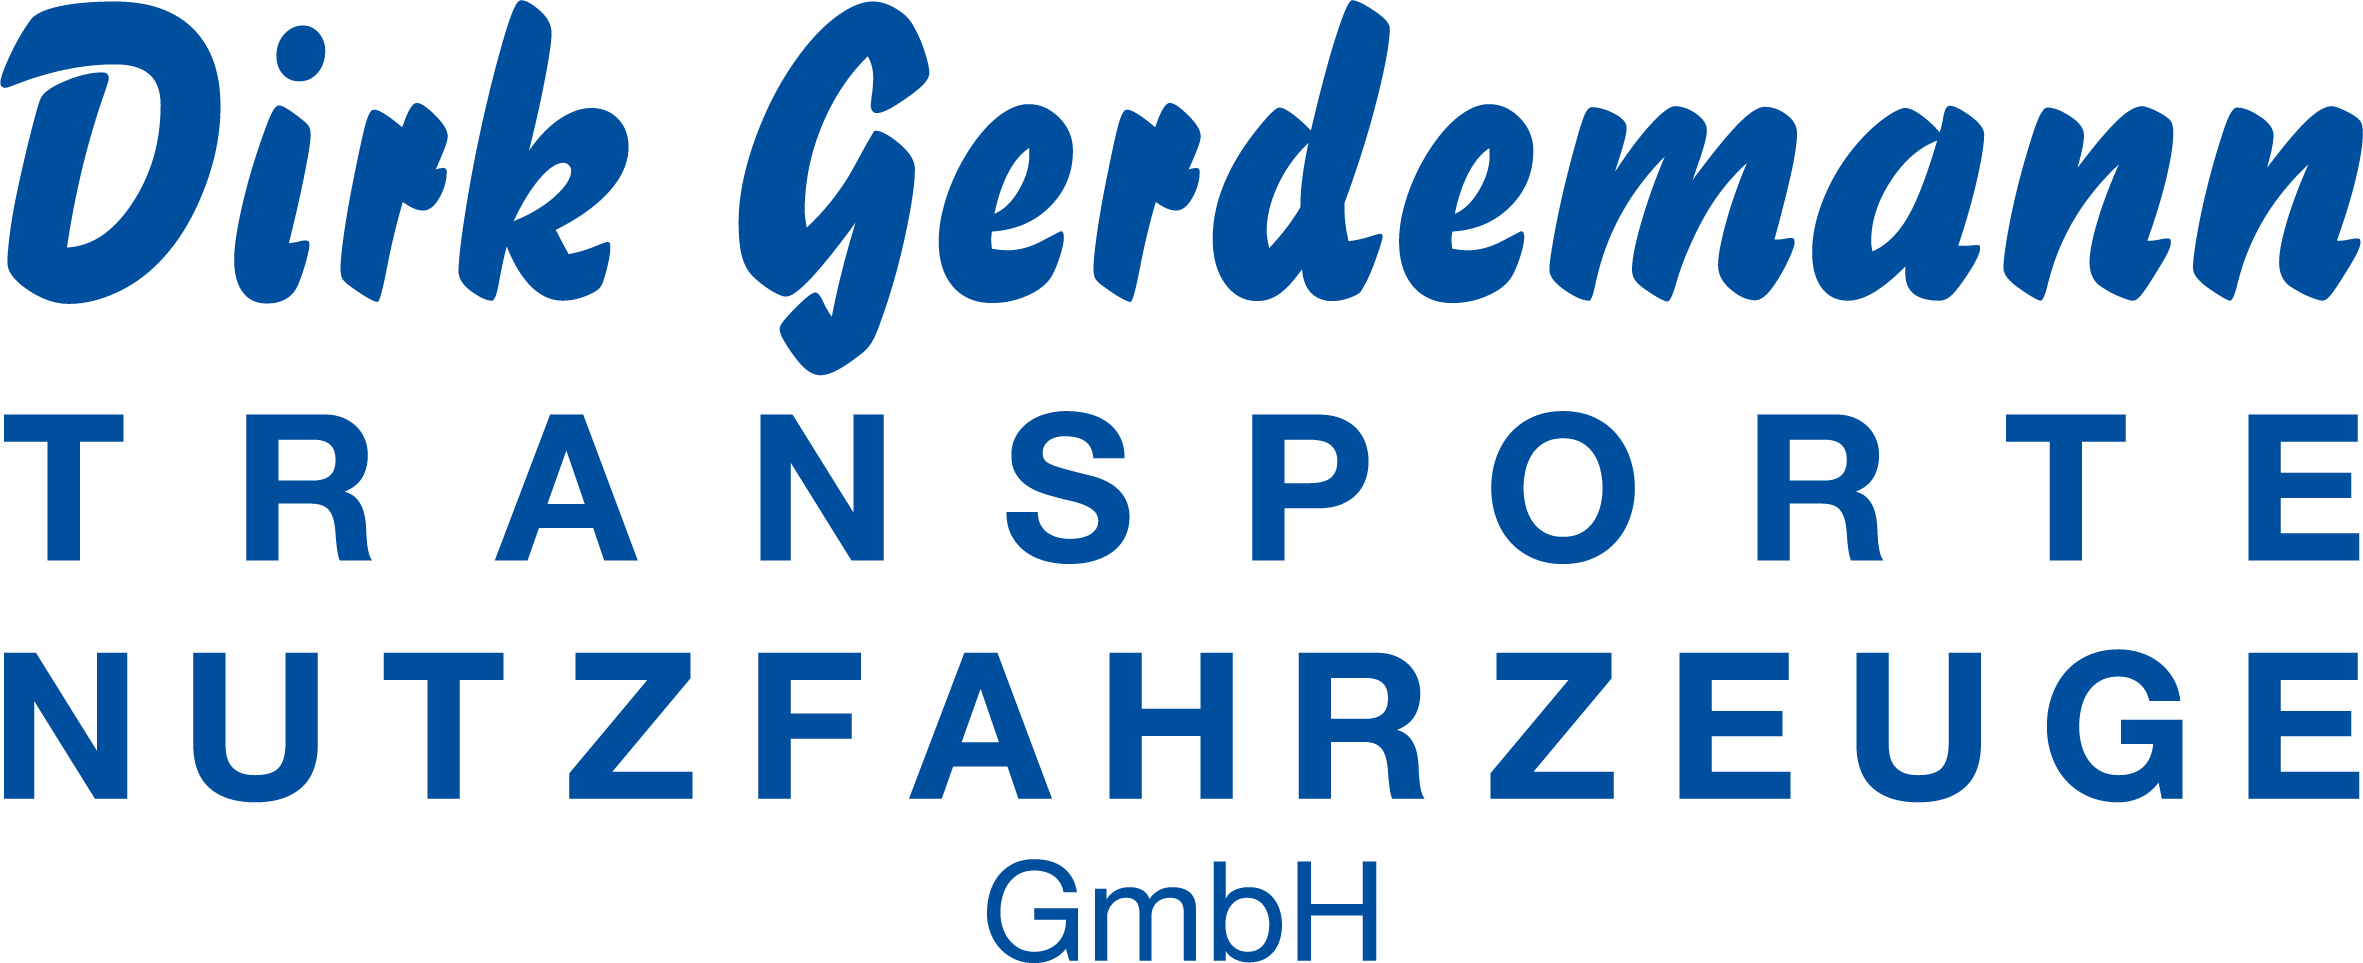 Gerdemann Transporte